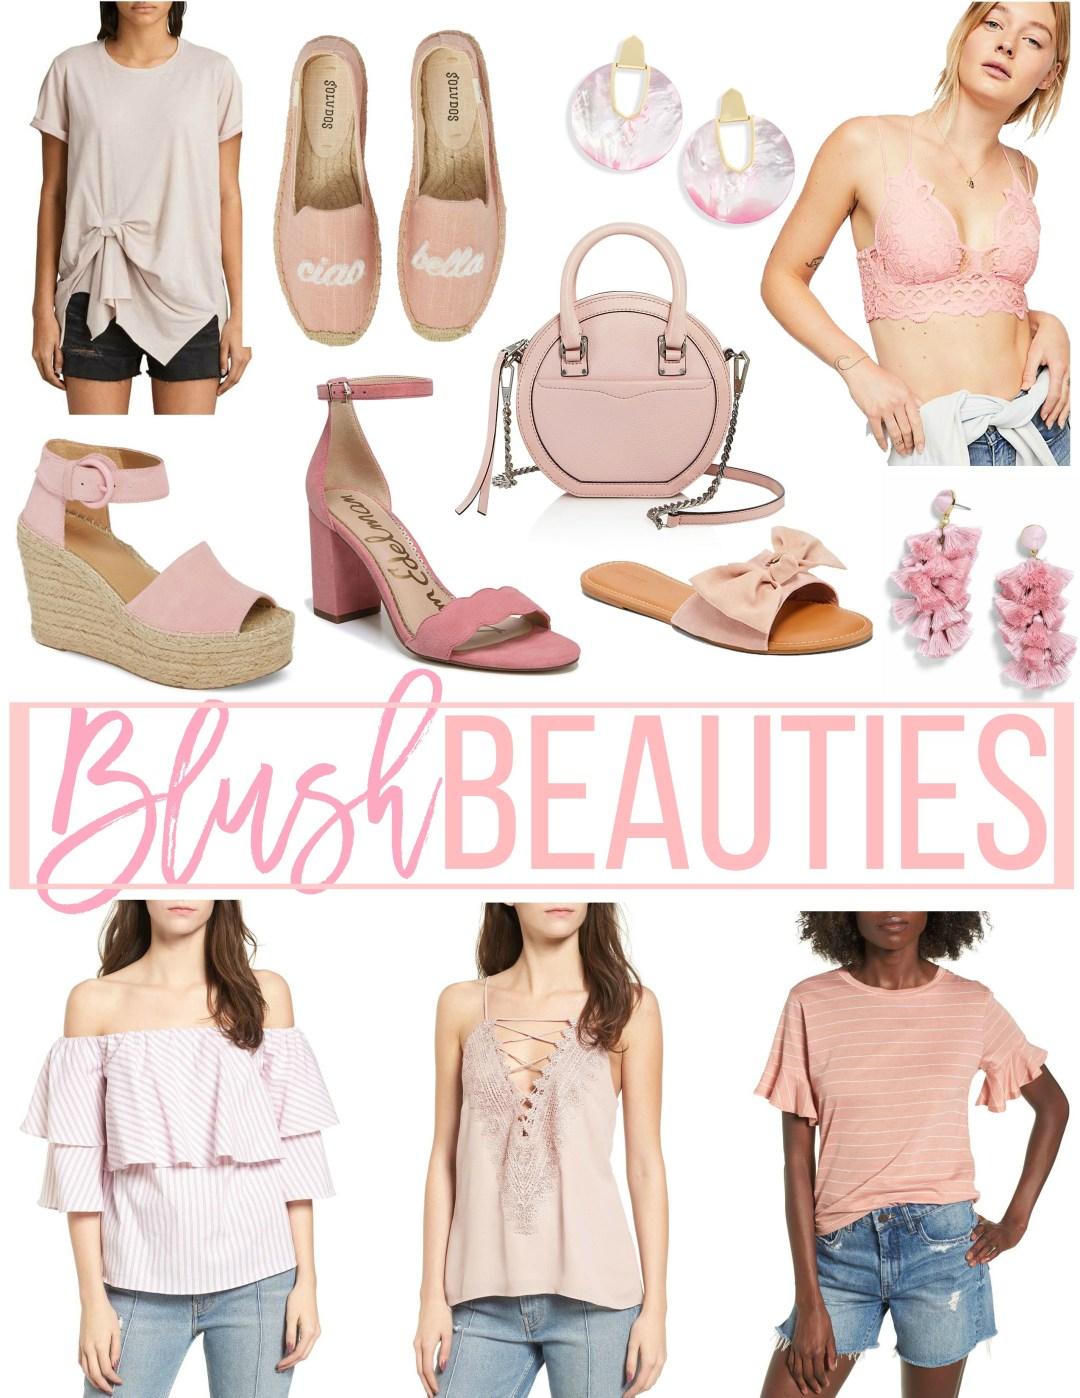 blush pink tops, blush pink earrings, blush pink shoes, blush beauties by Jaime Cittadino of Sunflowers and Stilettos blog